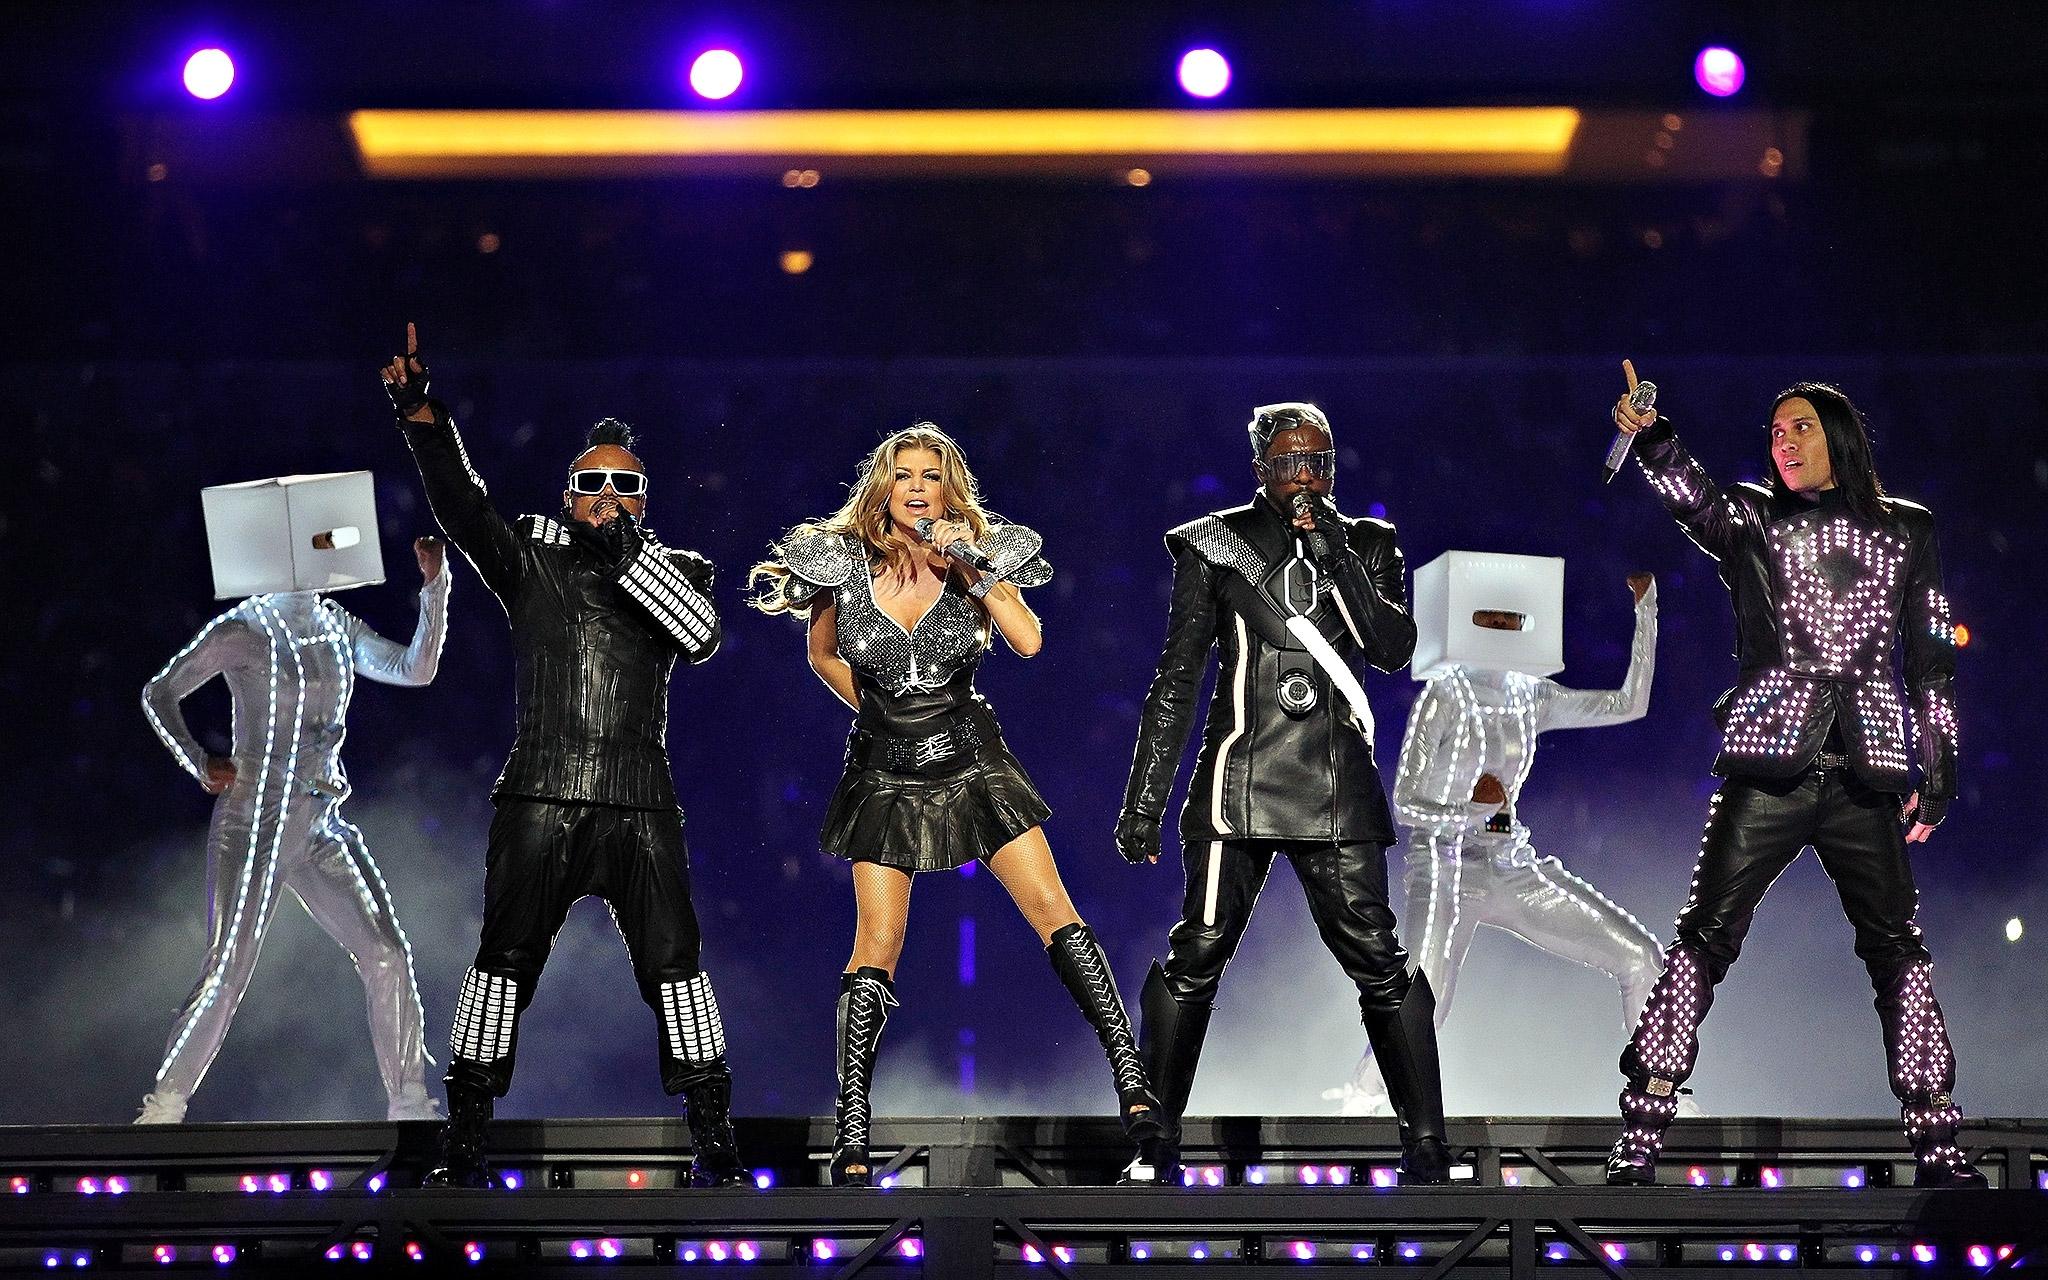 Super Bowl Xlv: The Black Eyed Peas - Super Bowl Halftime for Black Eyed Peas Super Bowl